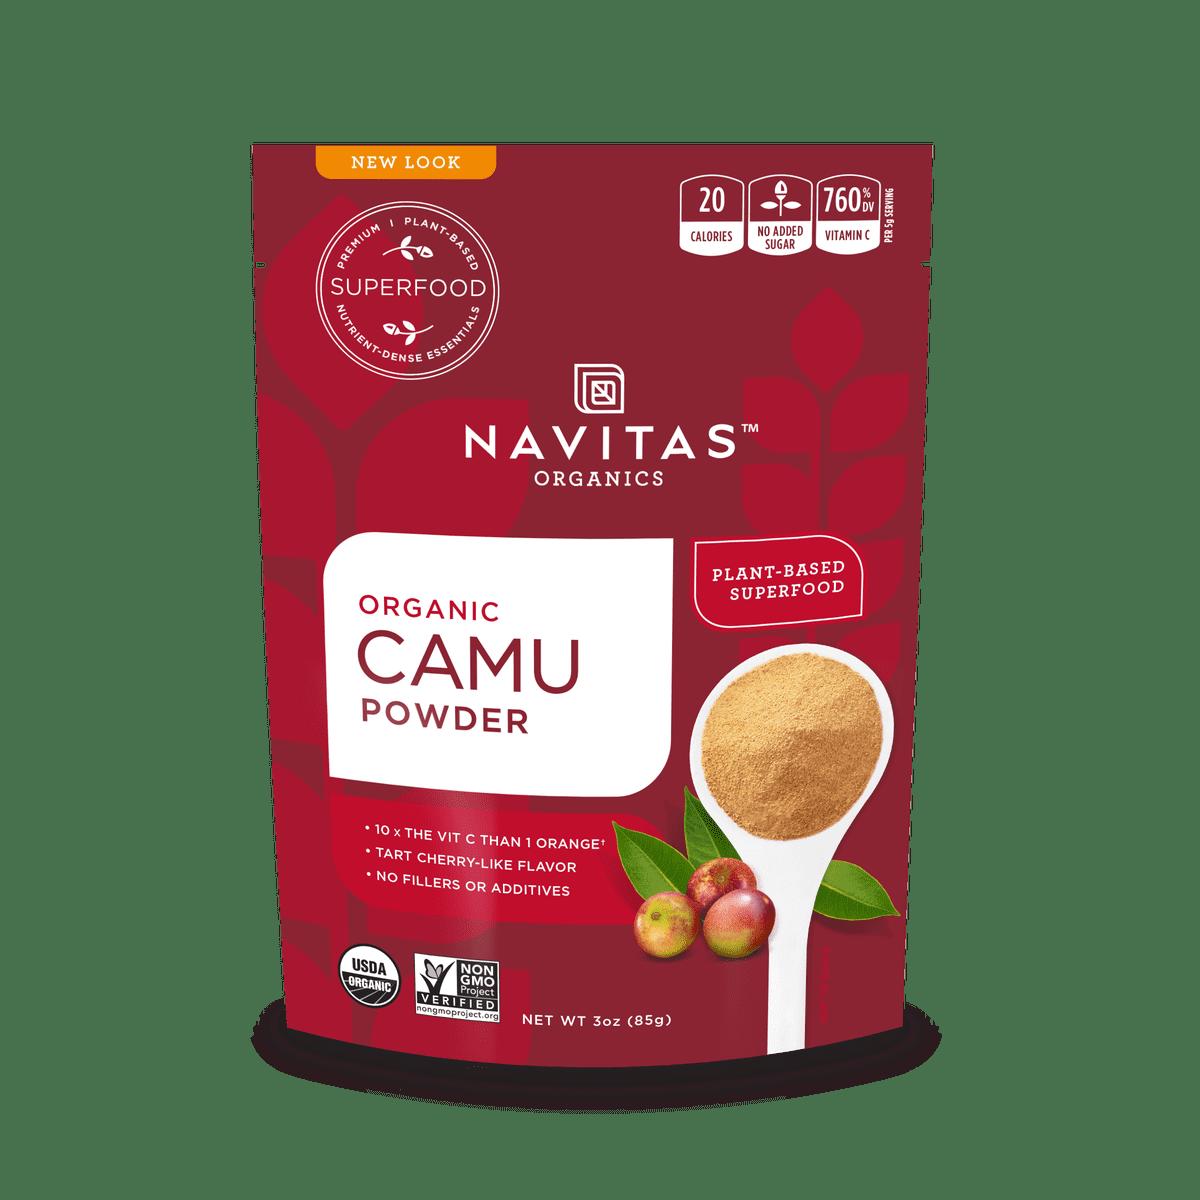 Navitas Organics Camu Camu Powder, 3.0 Oz, 17 Servings